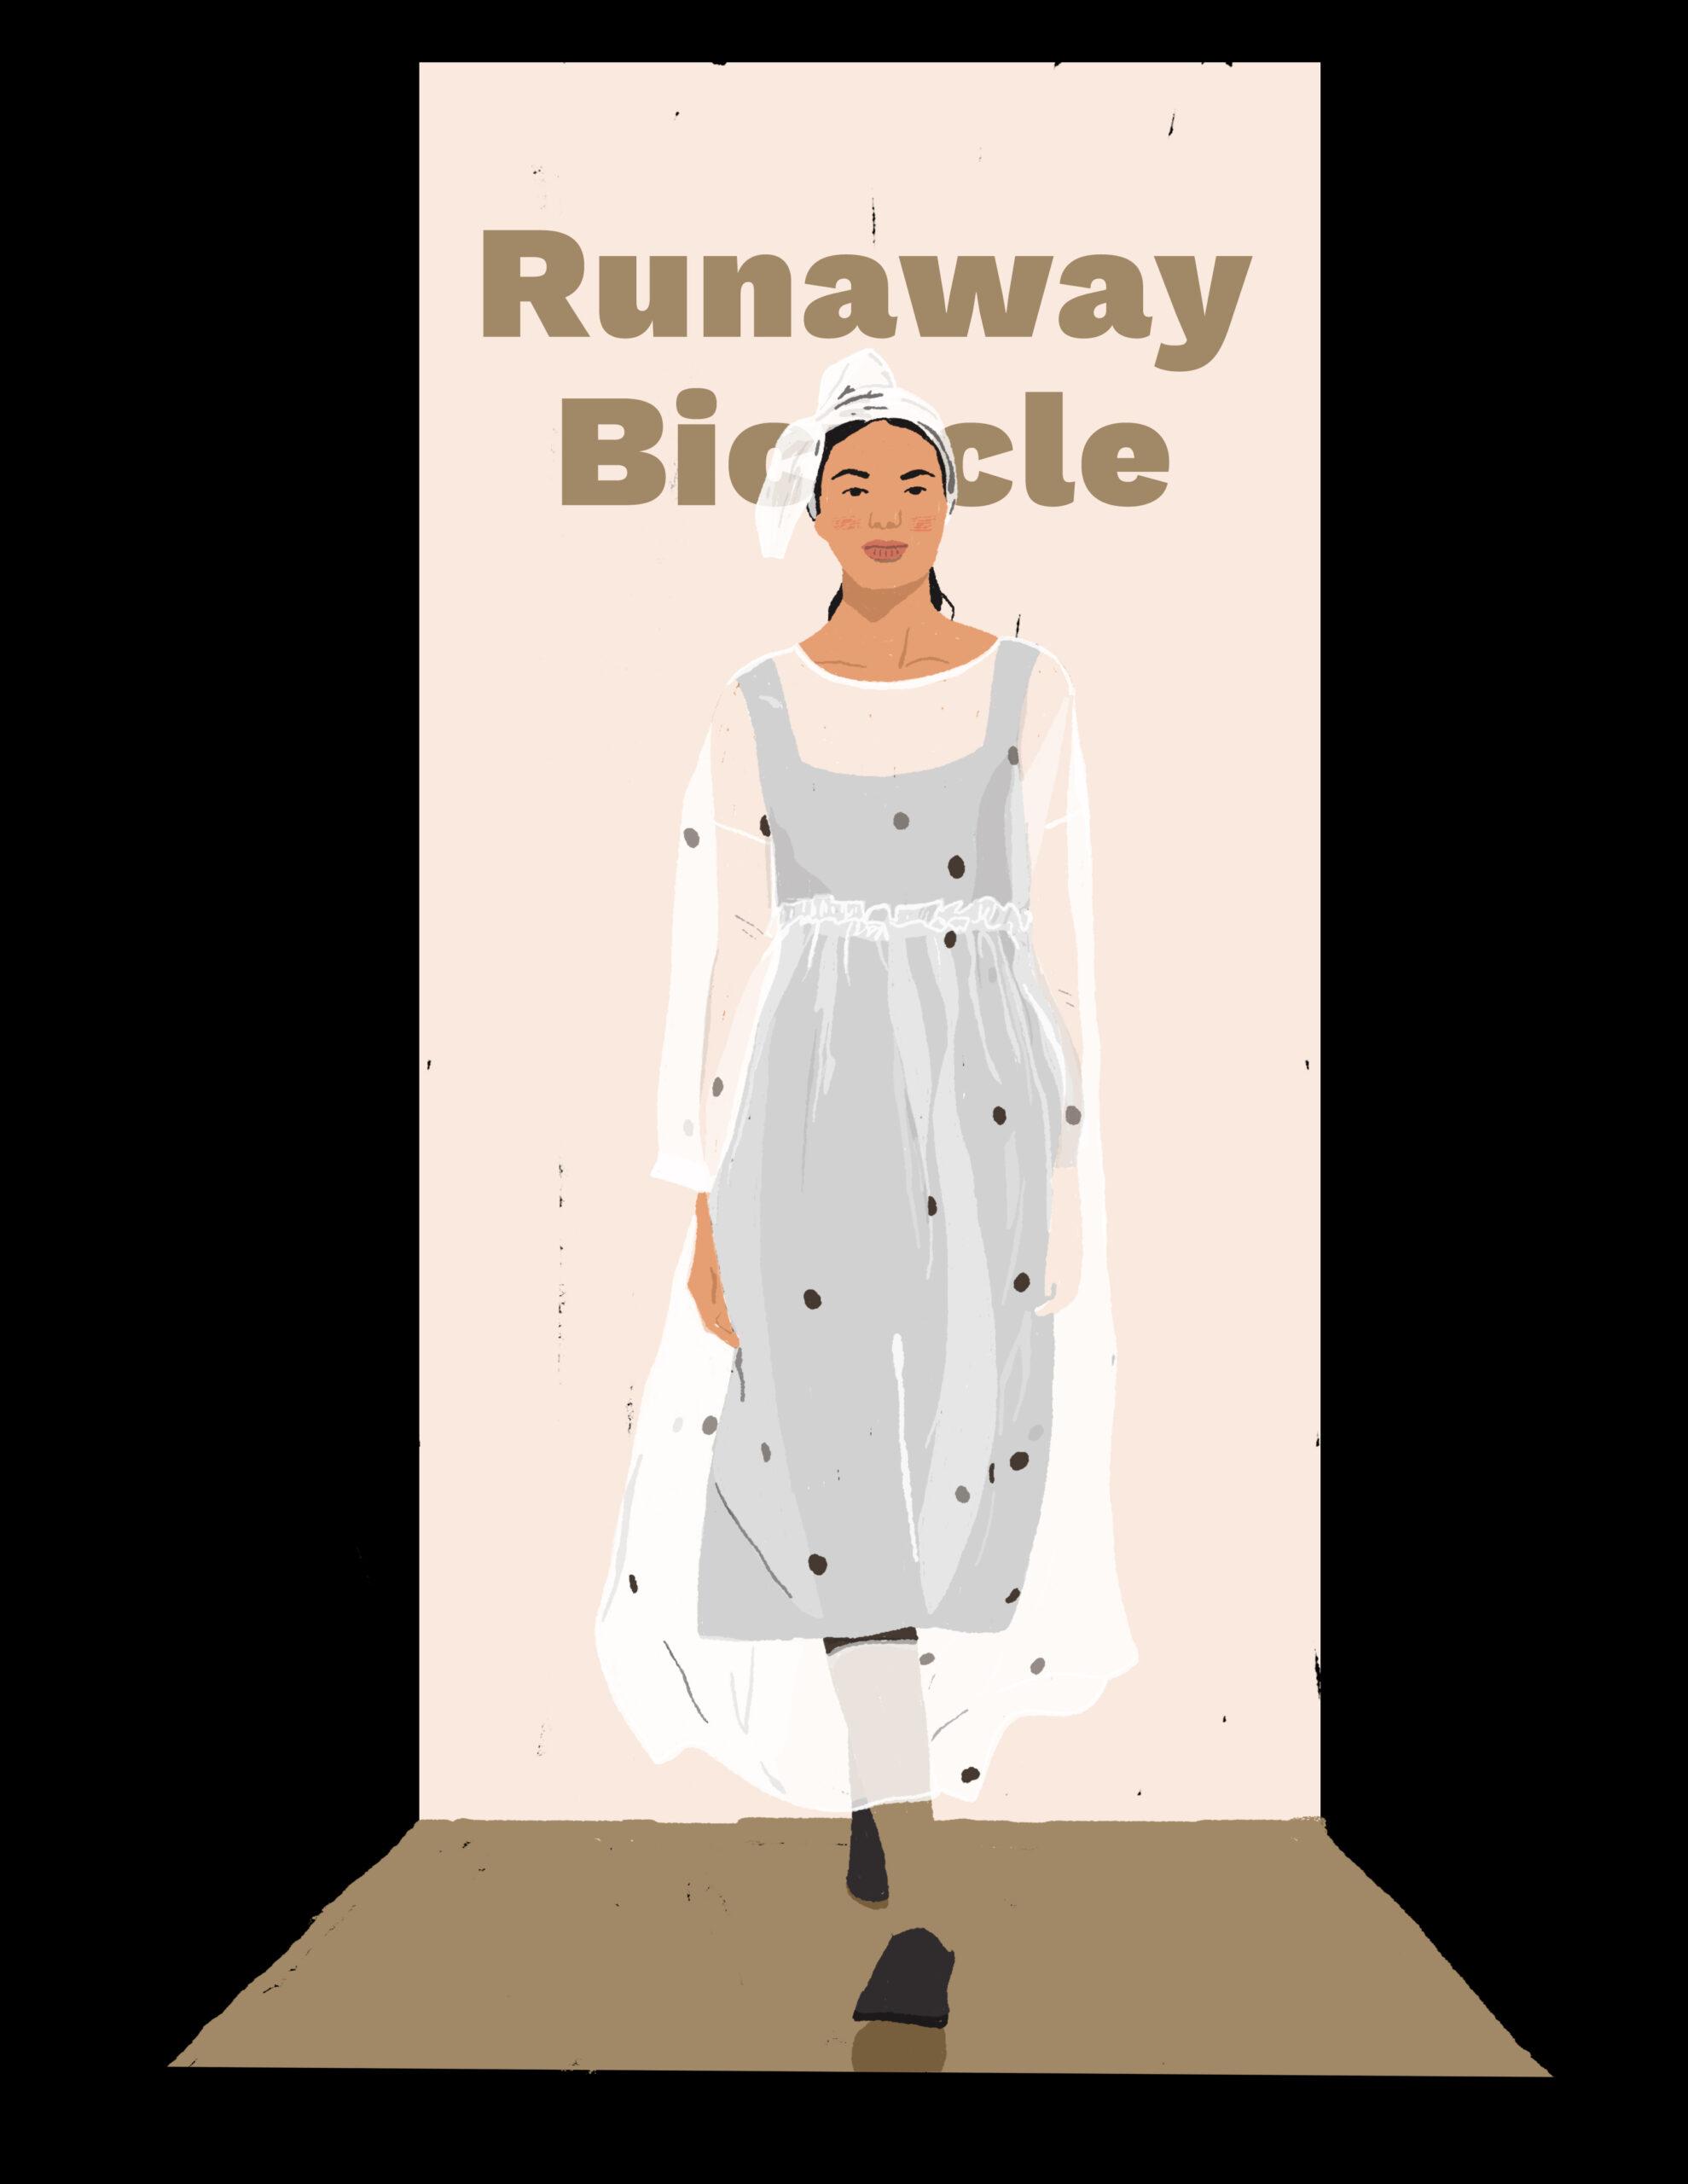 Runaway-Bicycle